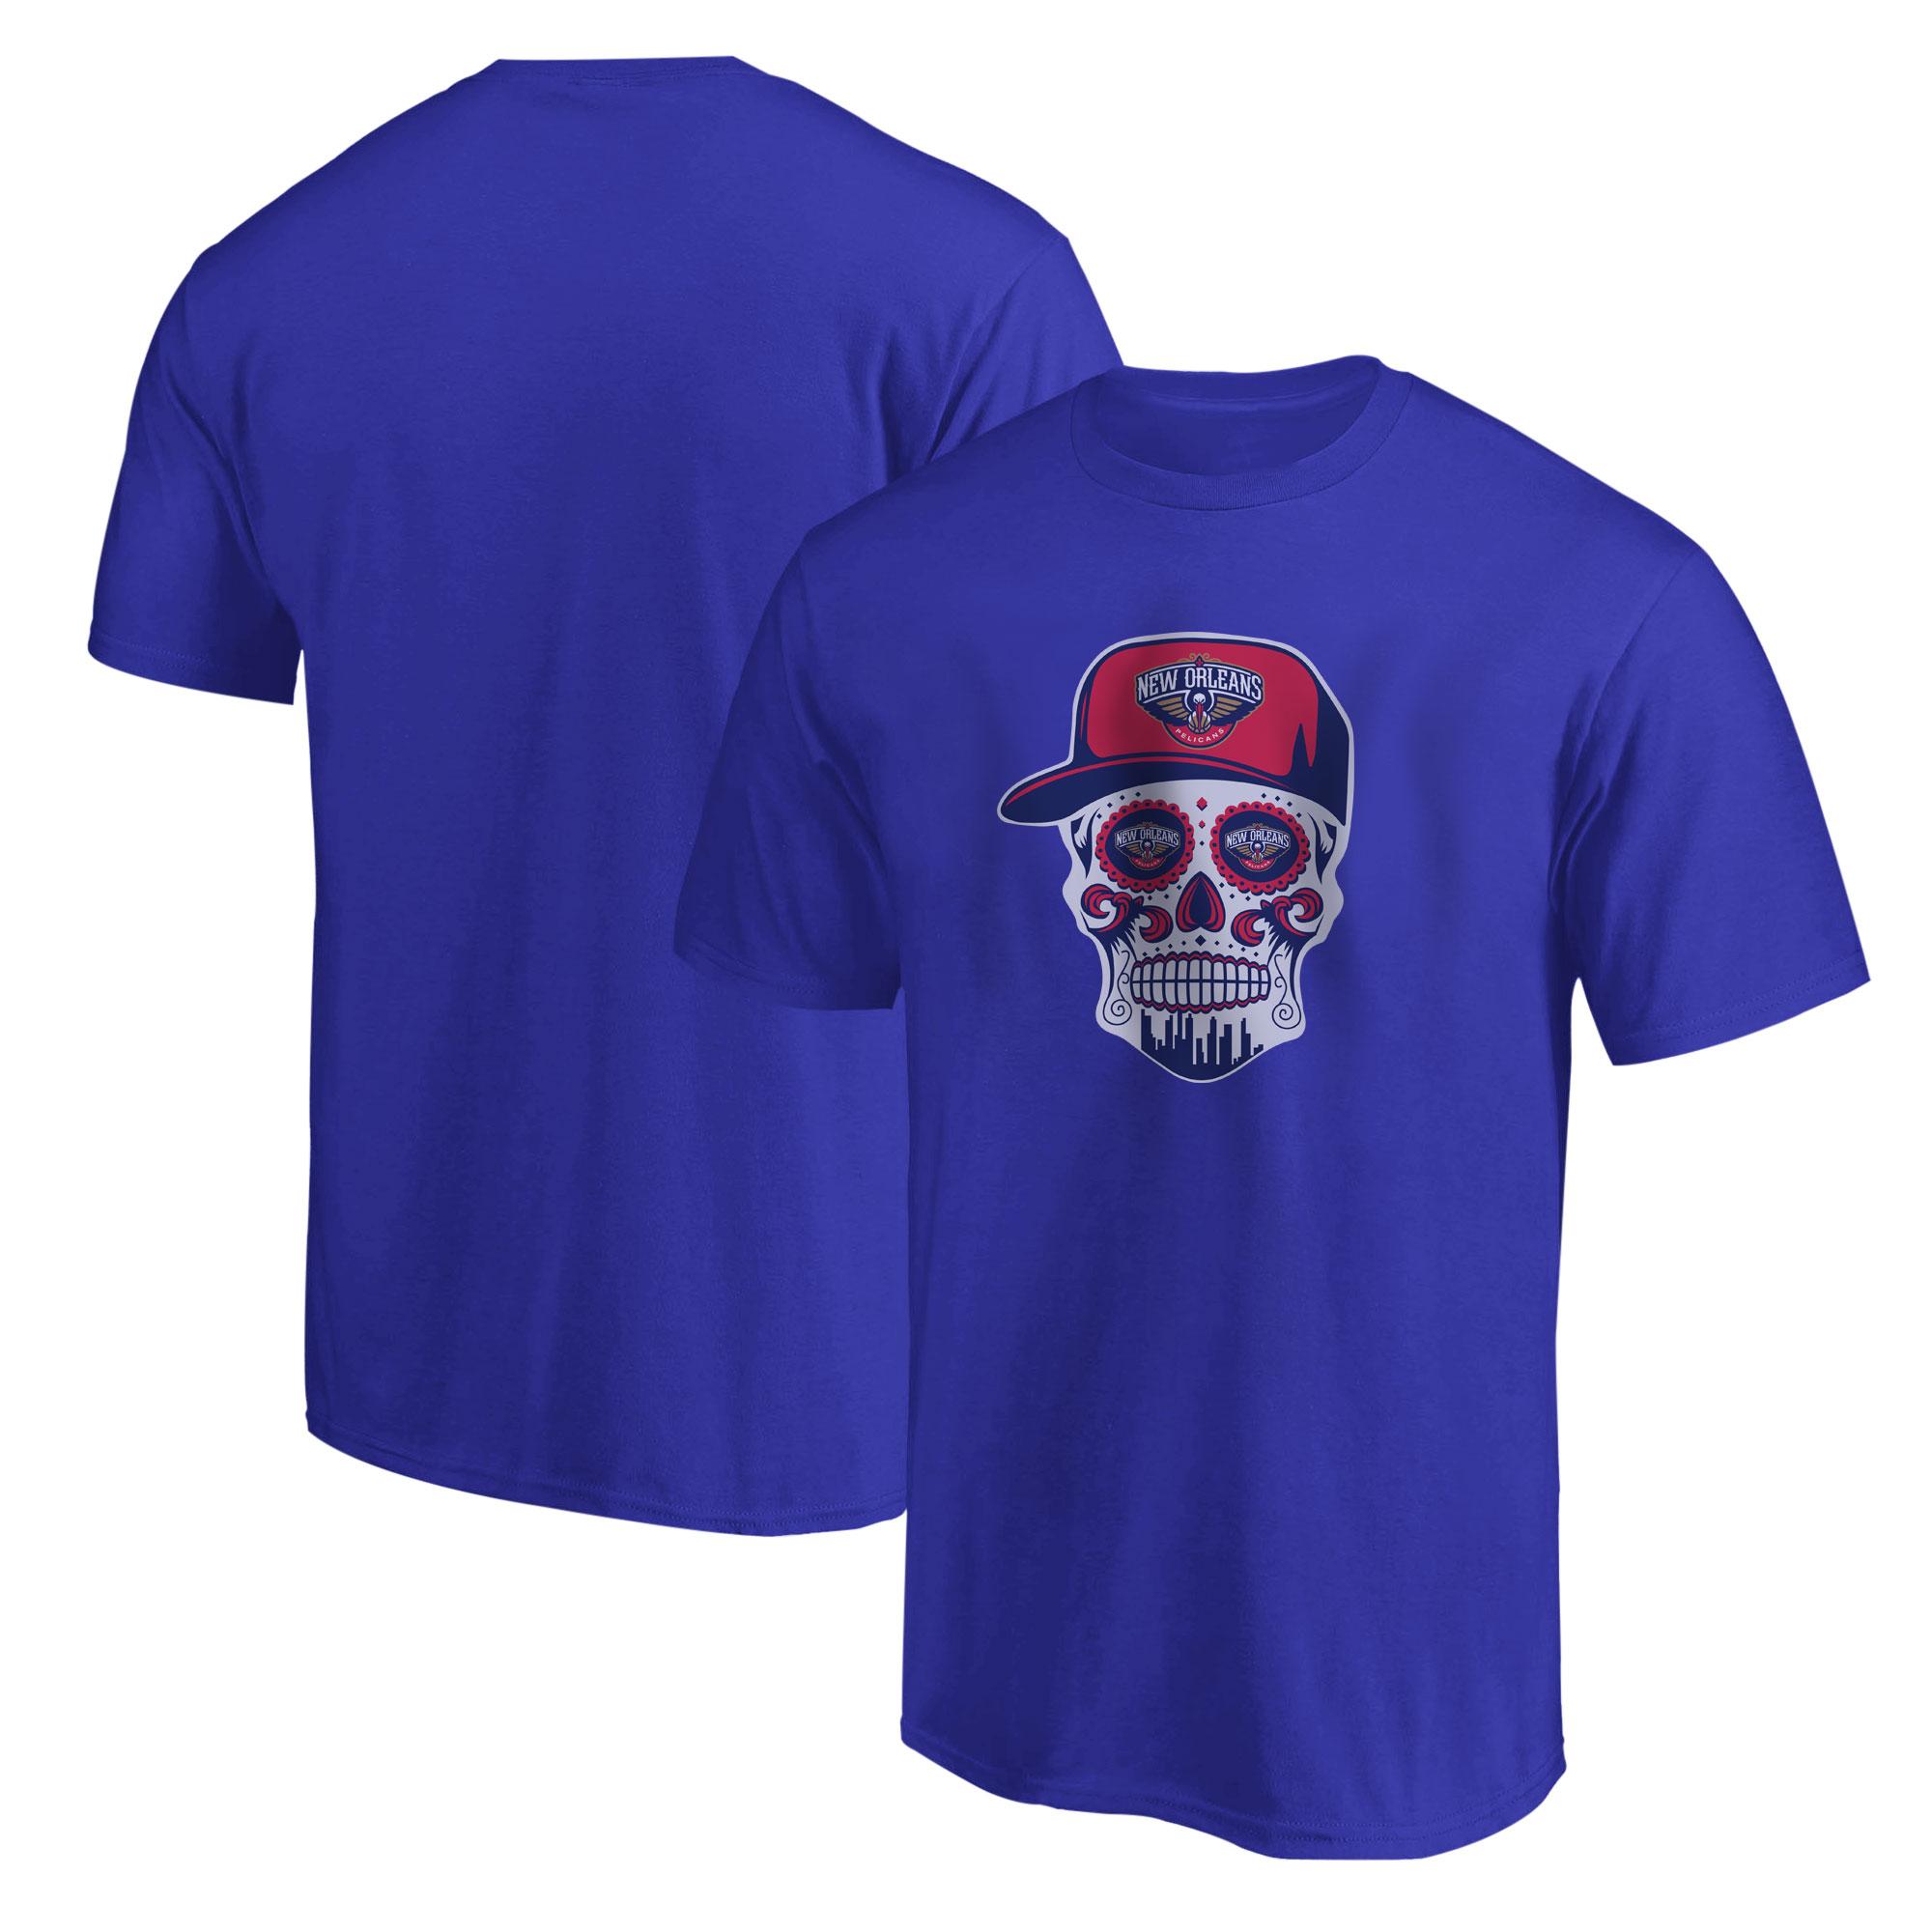 Pelicans Skull  Tshirt (TSH-BLU-NP-460-NBA-NOLA-SKULL)